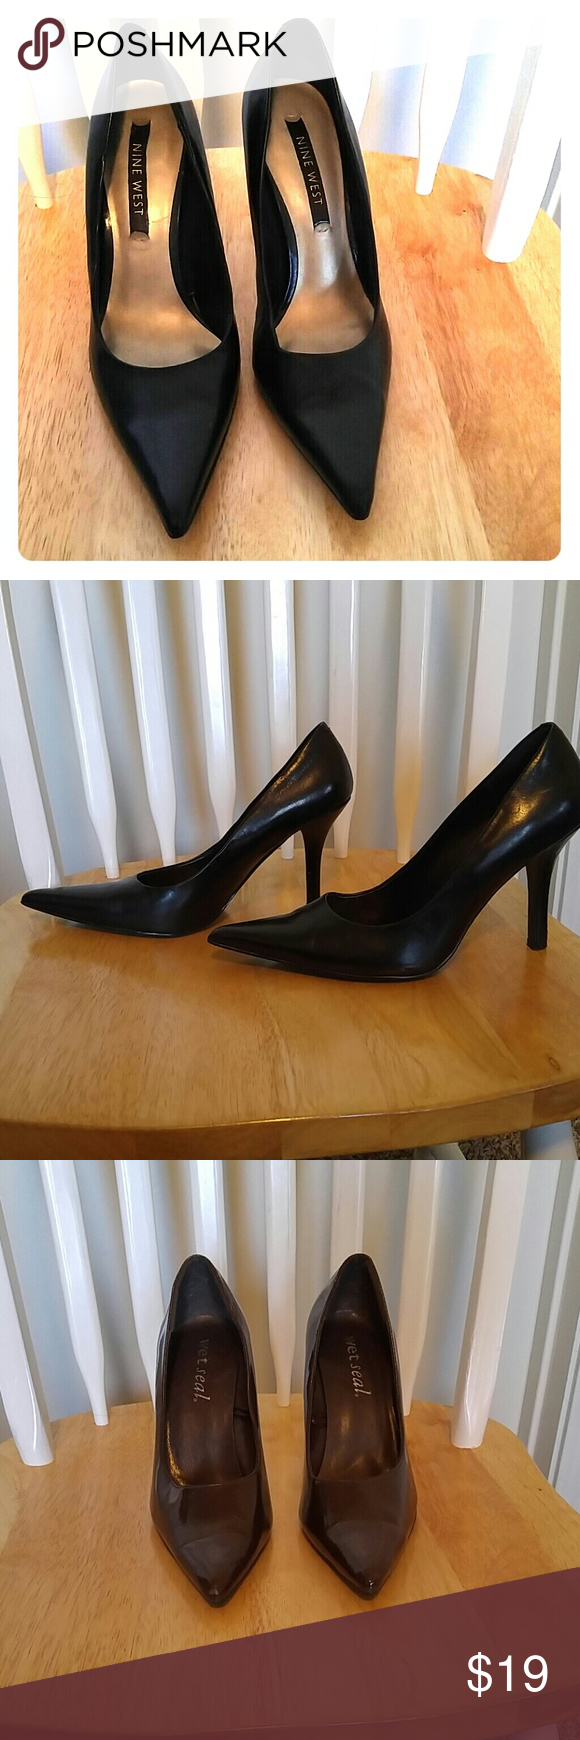 Bundle 2 pairs of heels -Blk size 7 Brown size 7.5 Bundle deal Black Nine west shoe size 7 and Brown Wet Seal heel size 7.5 both hardly used Nine West & Wet Seal Shoes Heels